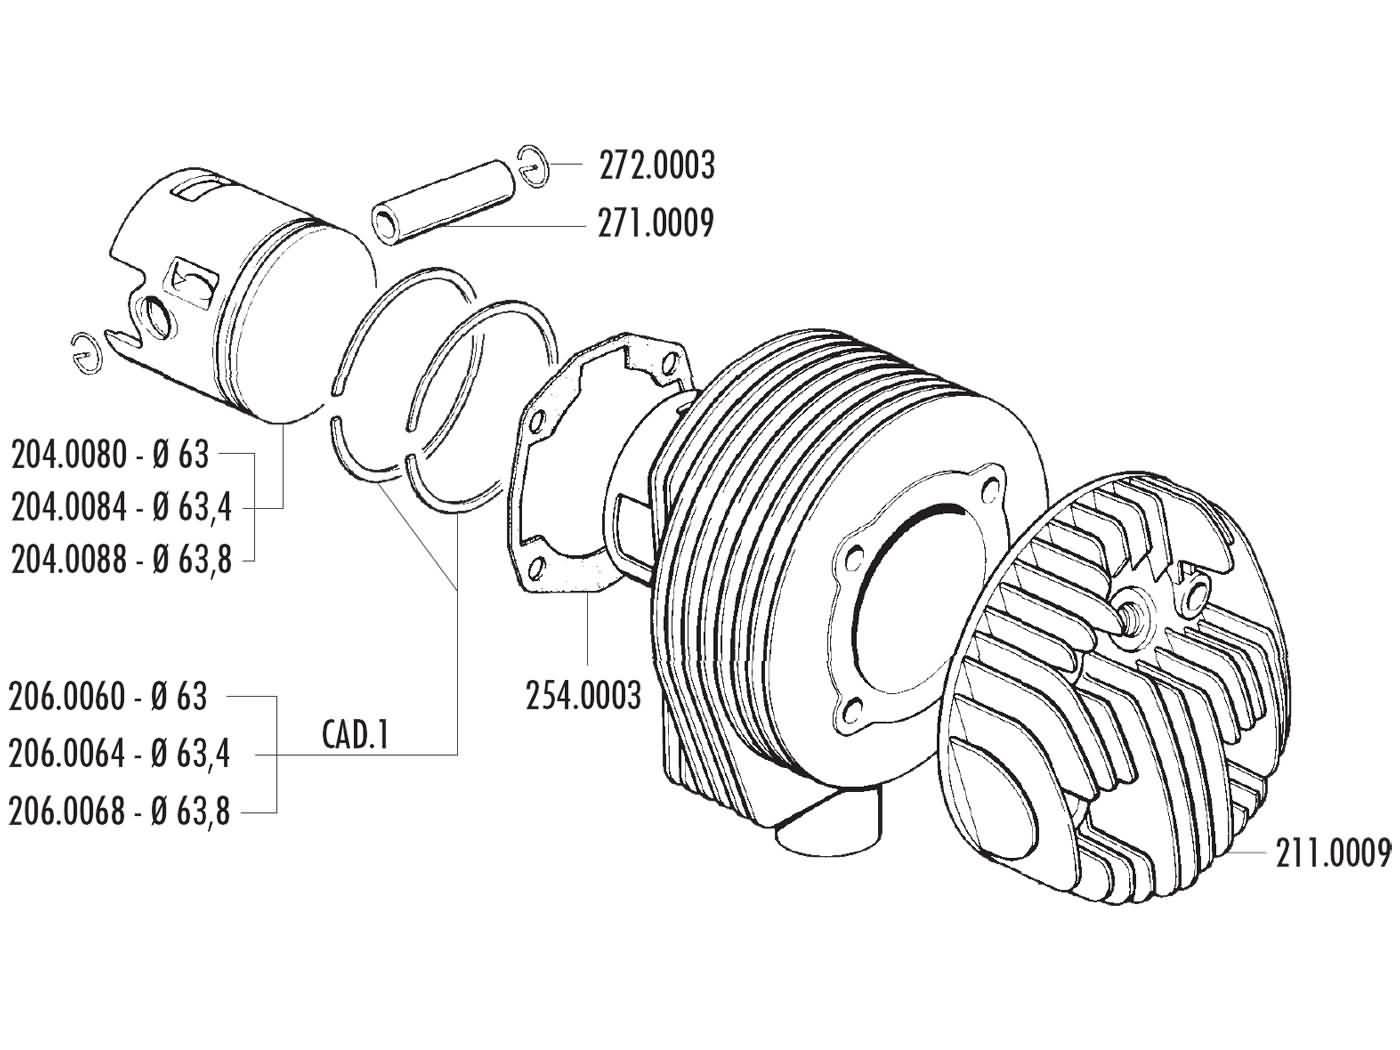 piston kit Polini 177cc 63mm for LML Star Deluxe, Vespa PX